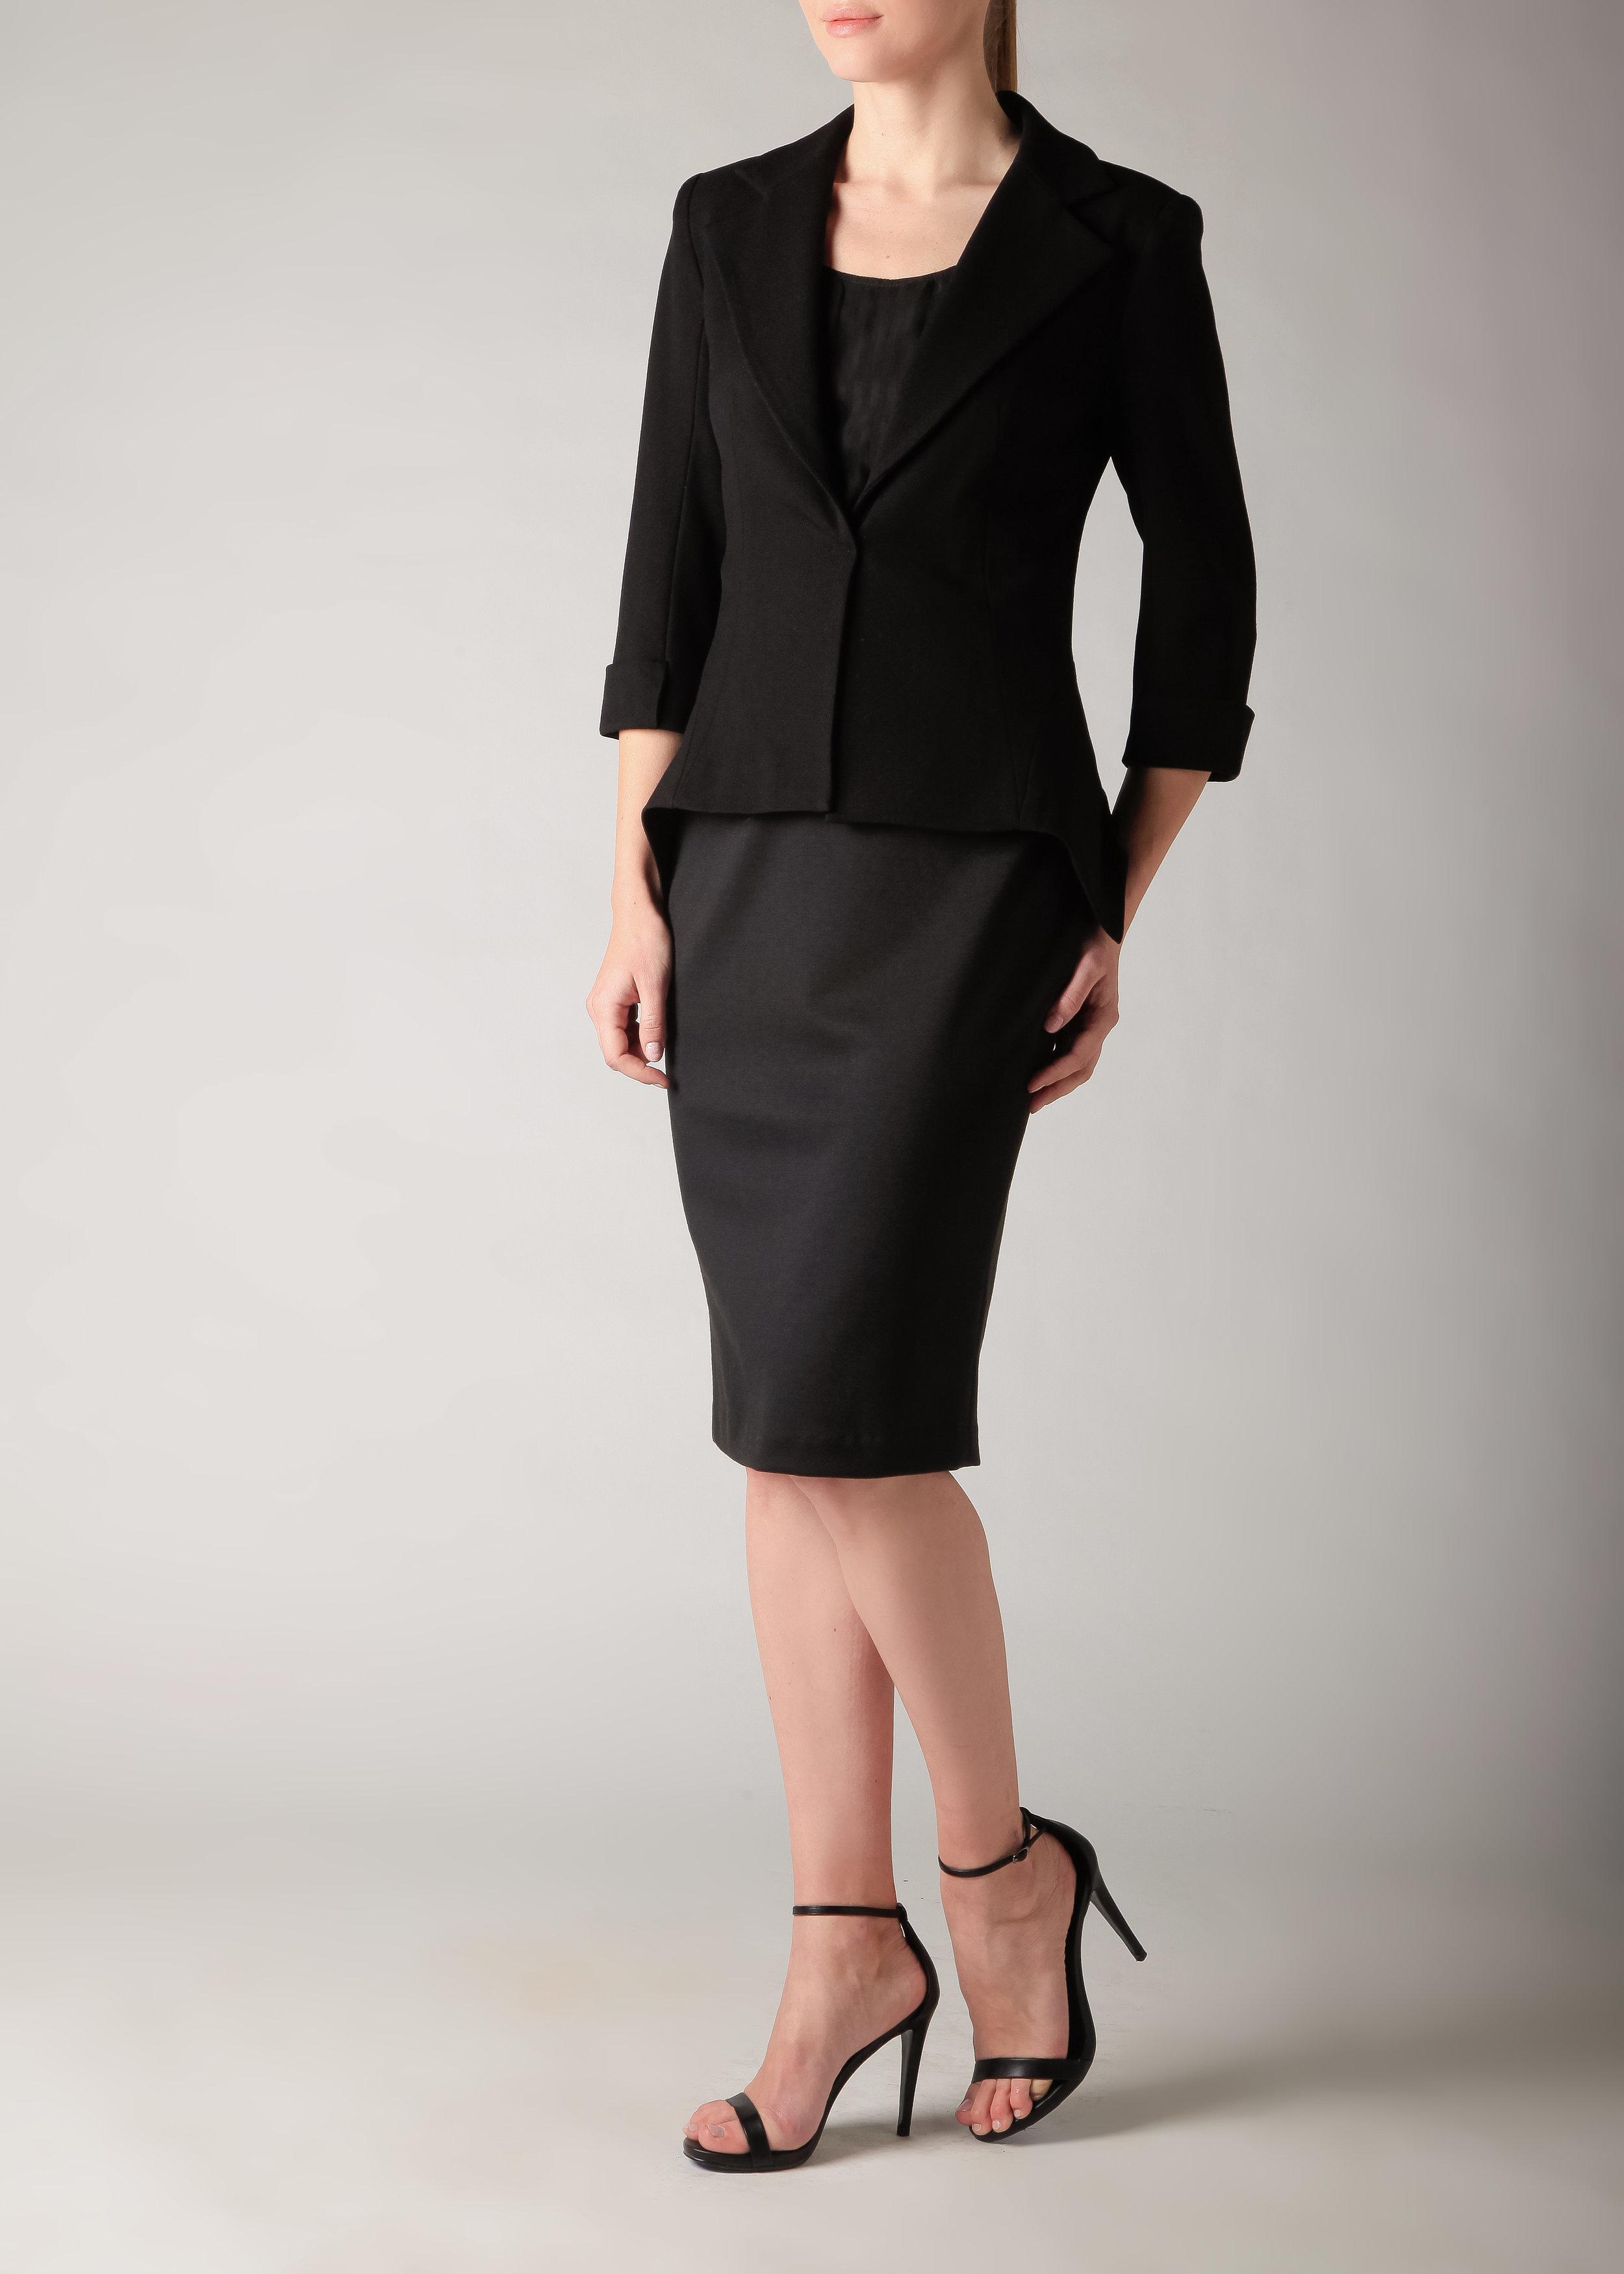 Pair it With - Ponte Pencil Skirt